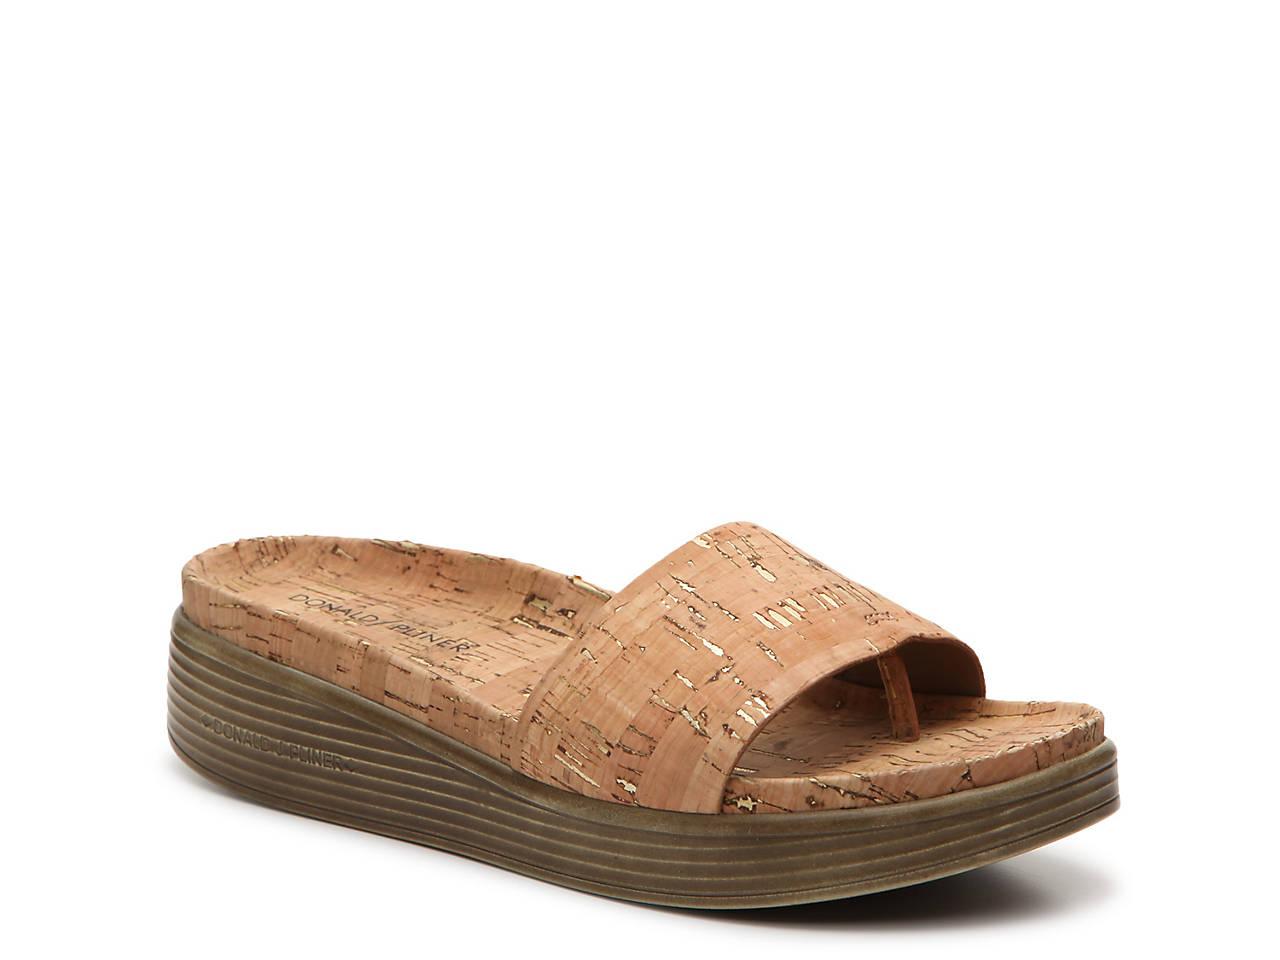 bb0c809bcdf3 Donald Pliner Fiji Wedge Sandal Women s Shoes